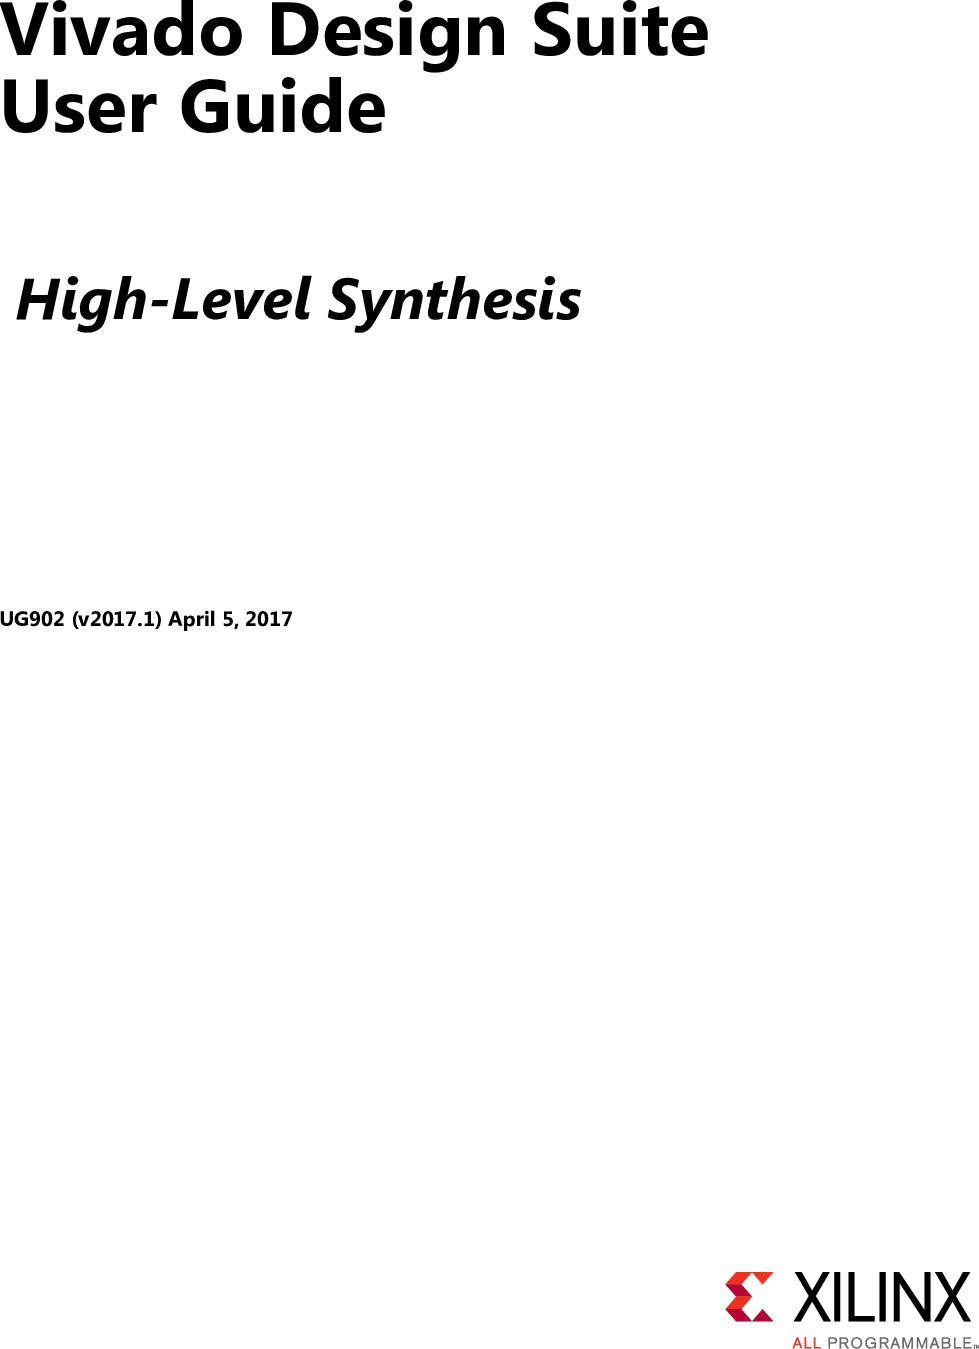 Vivado Design Suite User Guide: High Level Synthesis